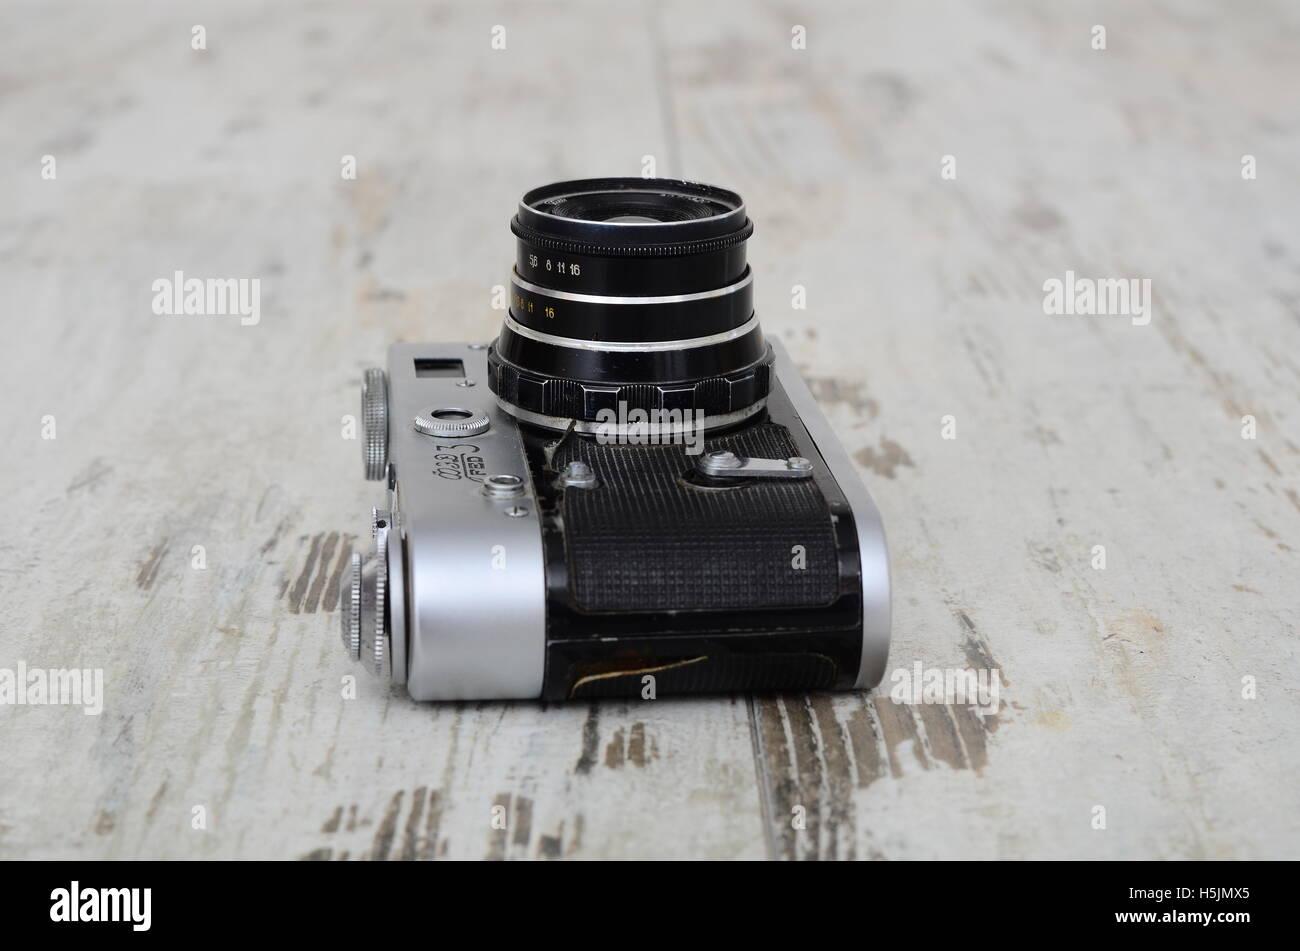 Lutsk Ukraine 2016 Illustrative Editorial old soviet film camera FED - 3 with lens INDUSTAR - 26M, isolated on white - Stock Image